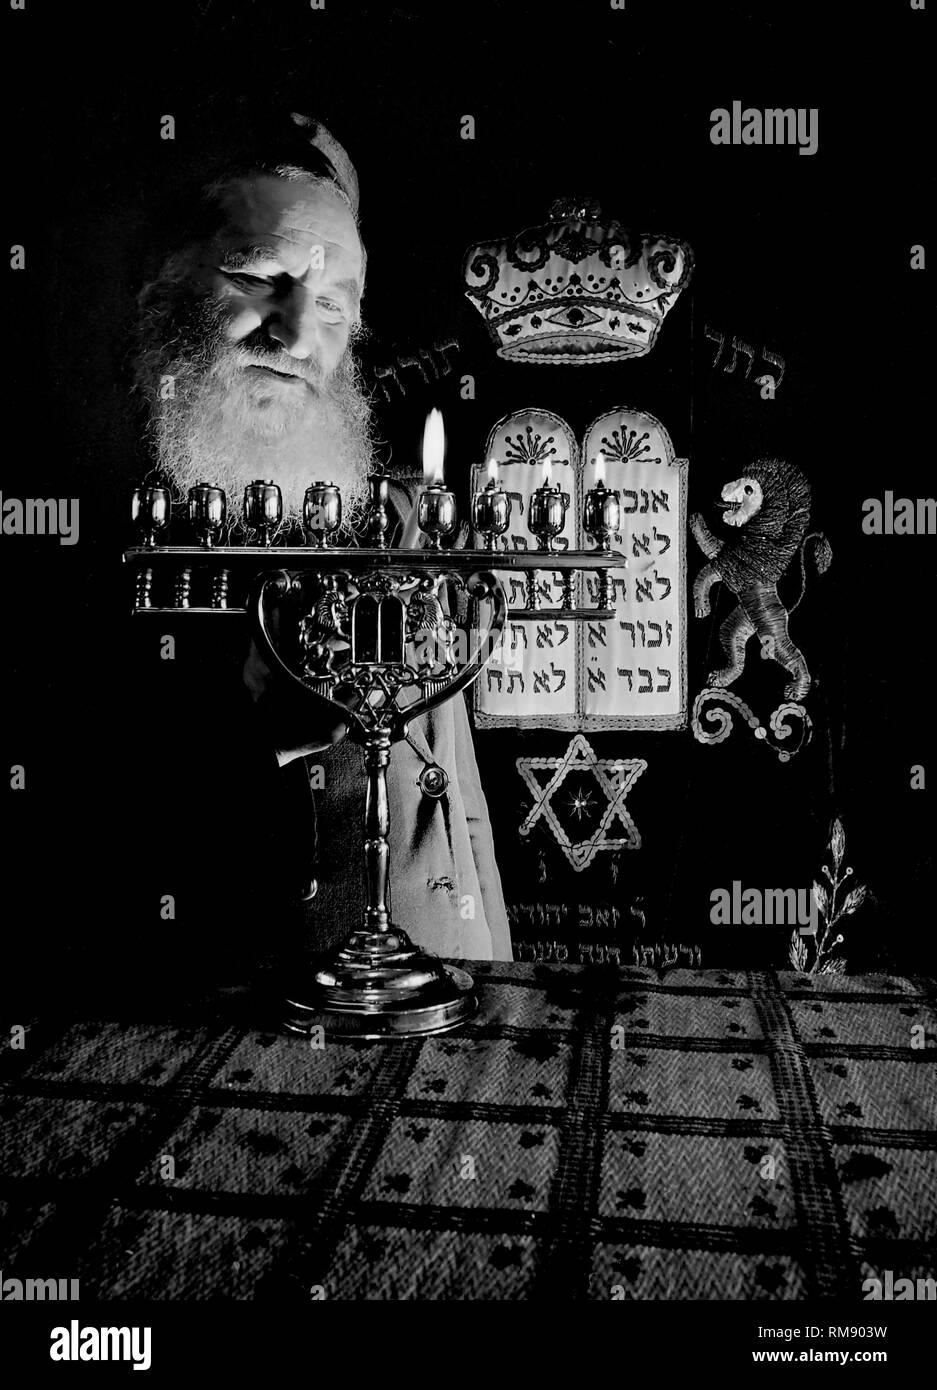 A Chicago rabbi lights Hanukkah candles, ca. 1944. Stock Photo